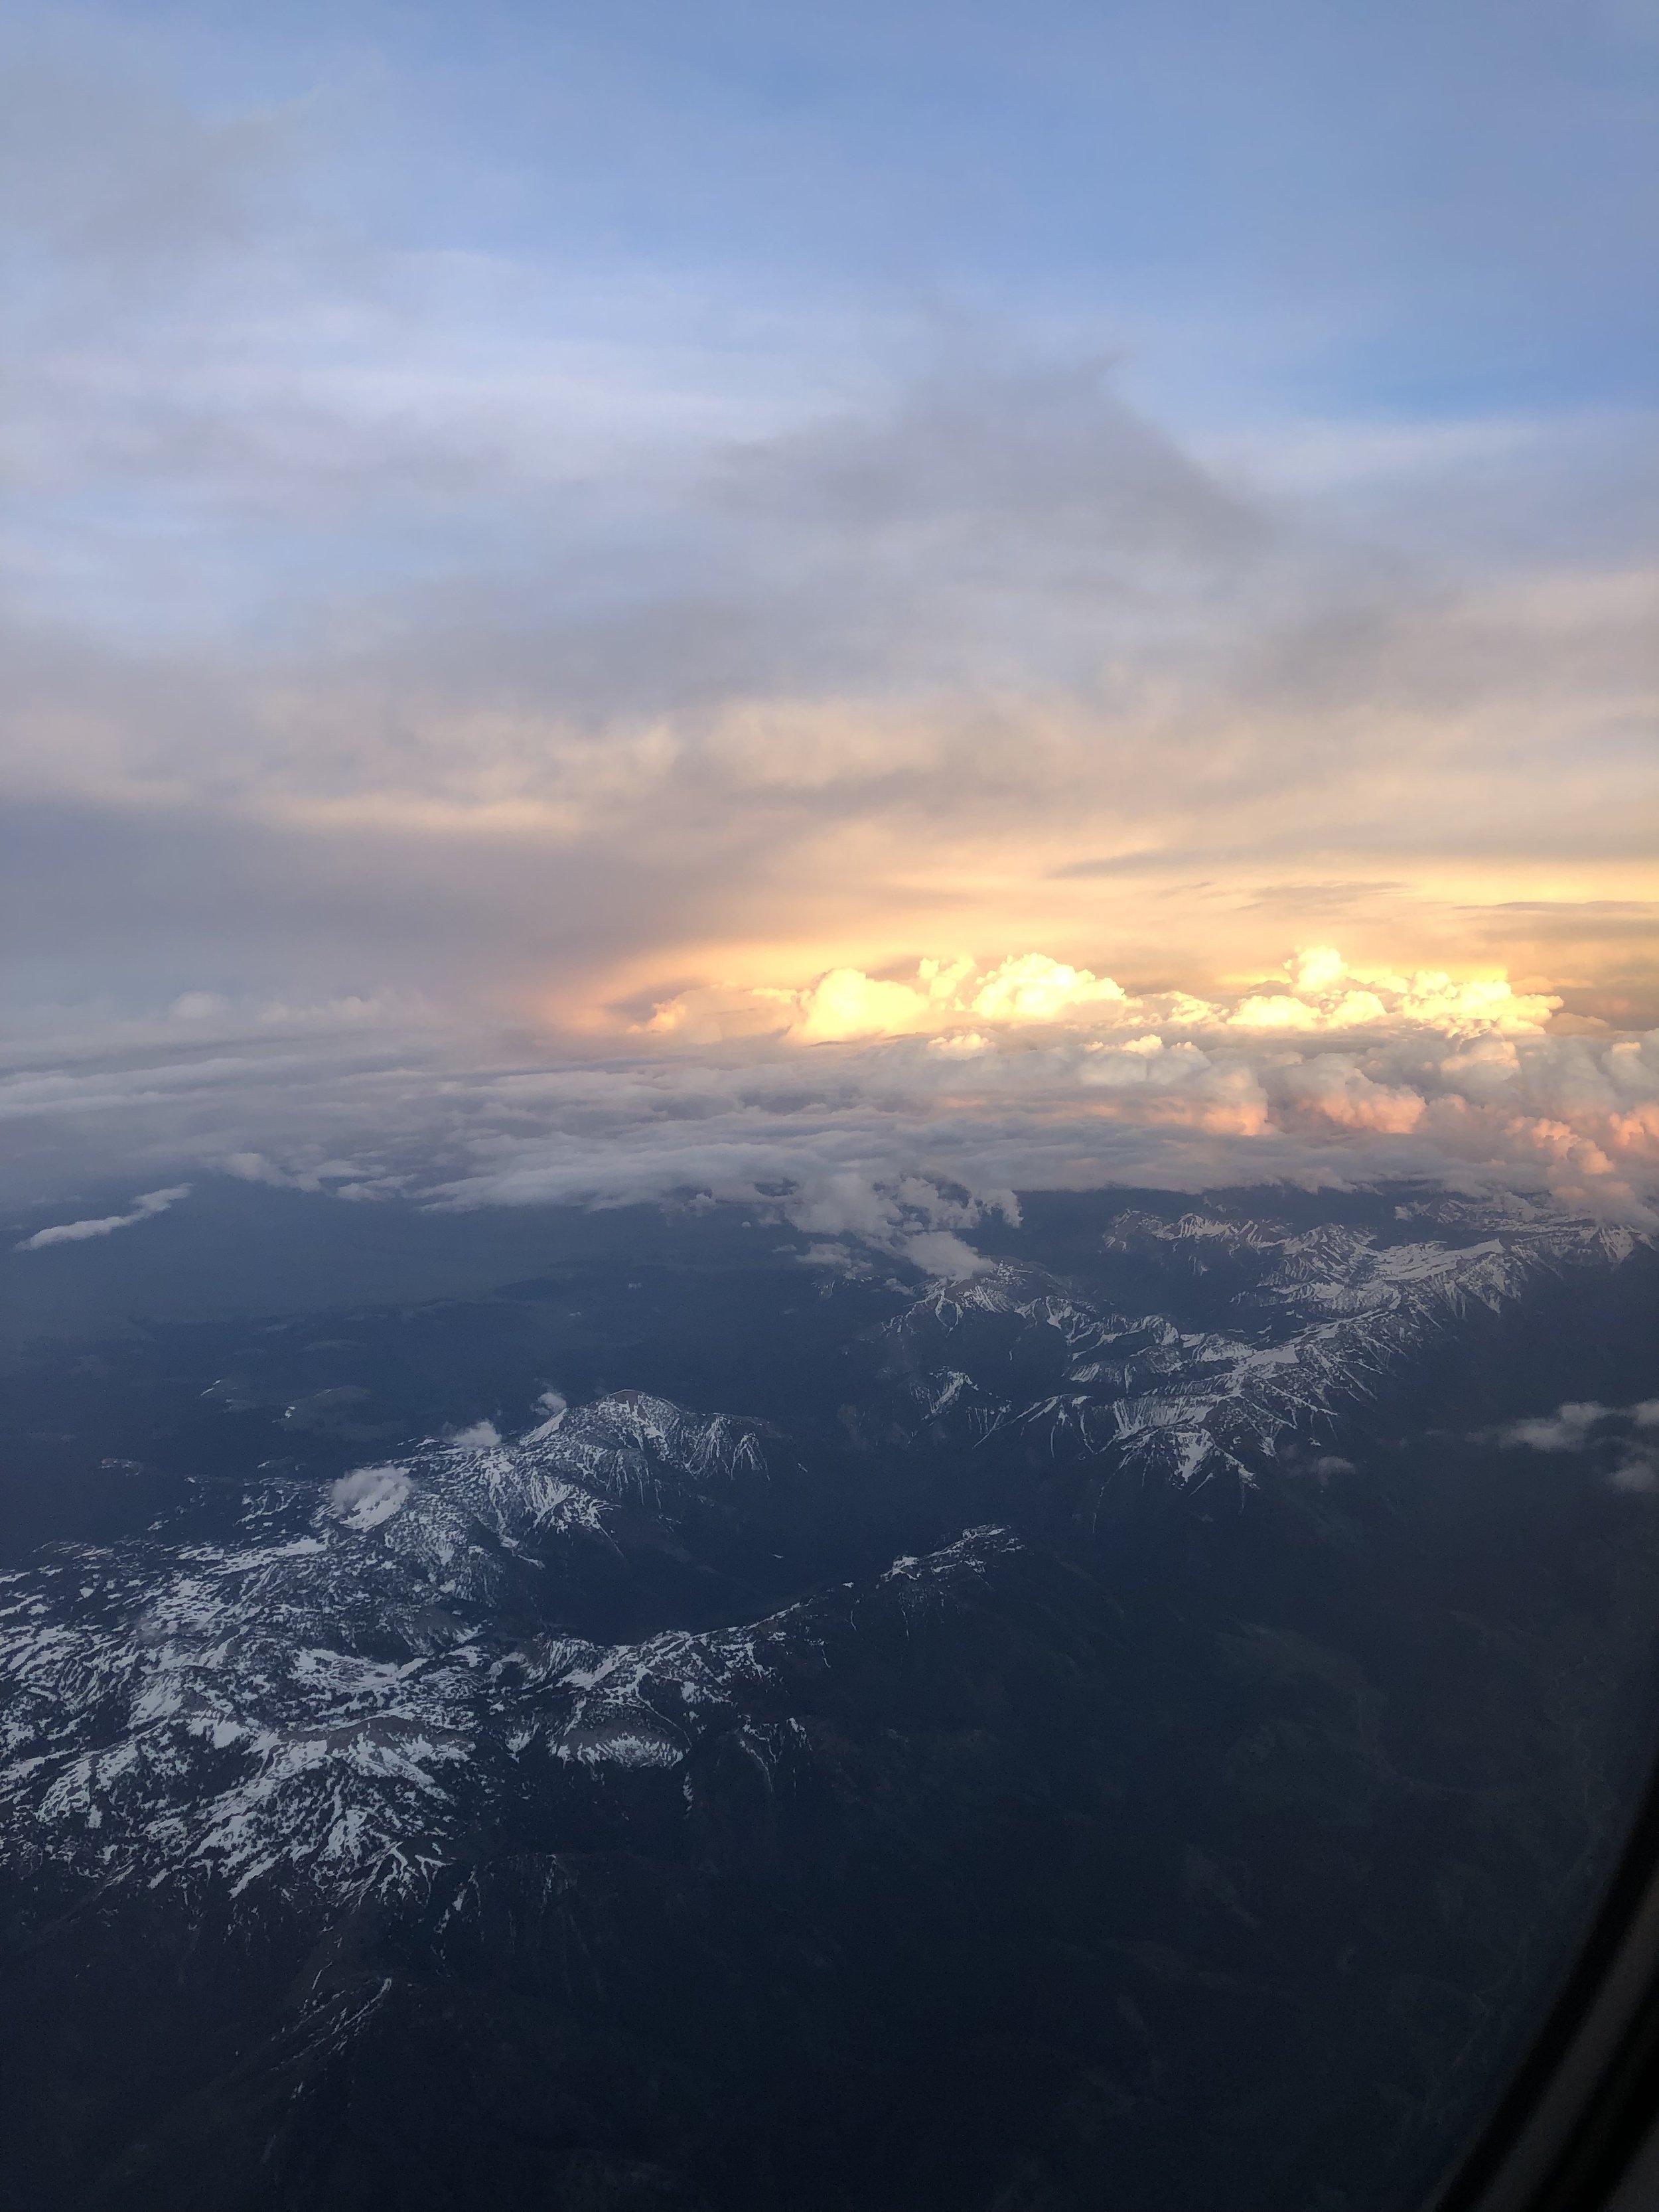 Flying into Jackson Hole, WY at sunset